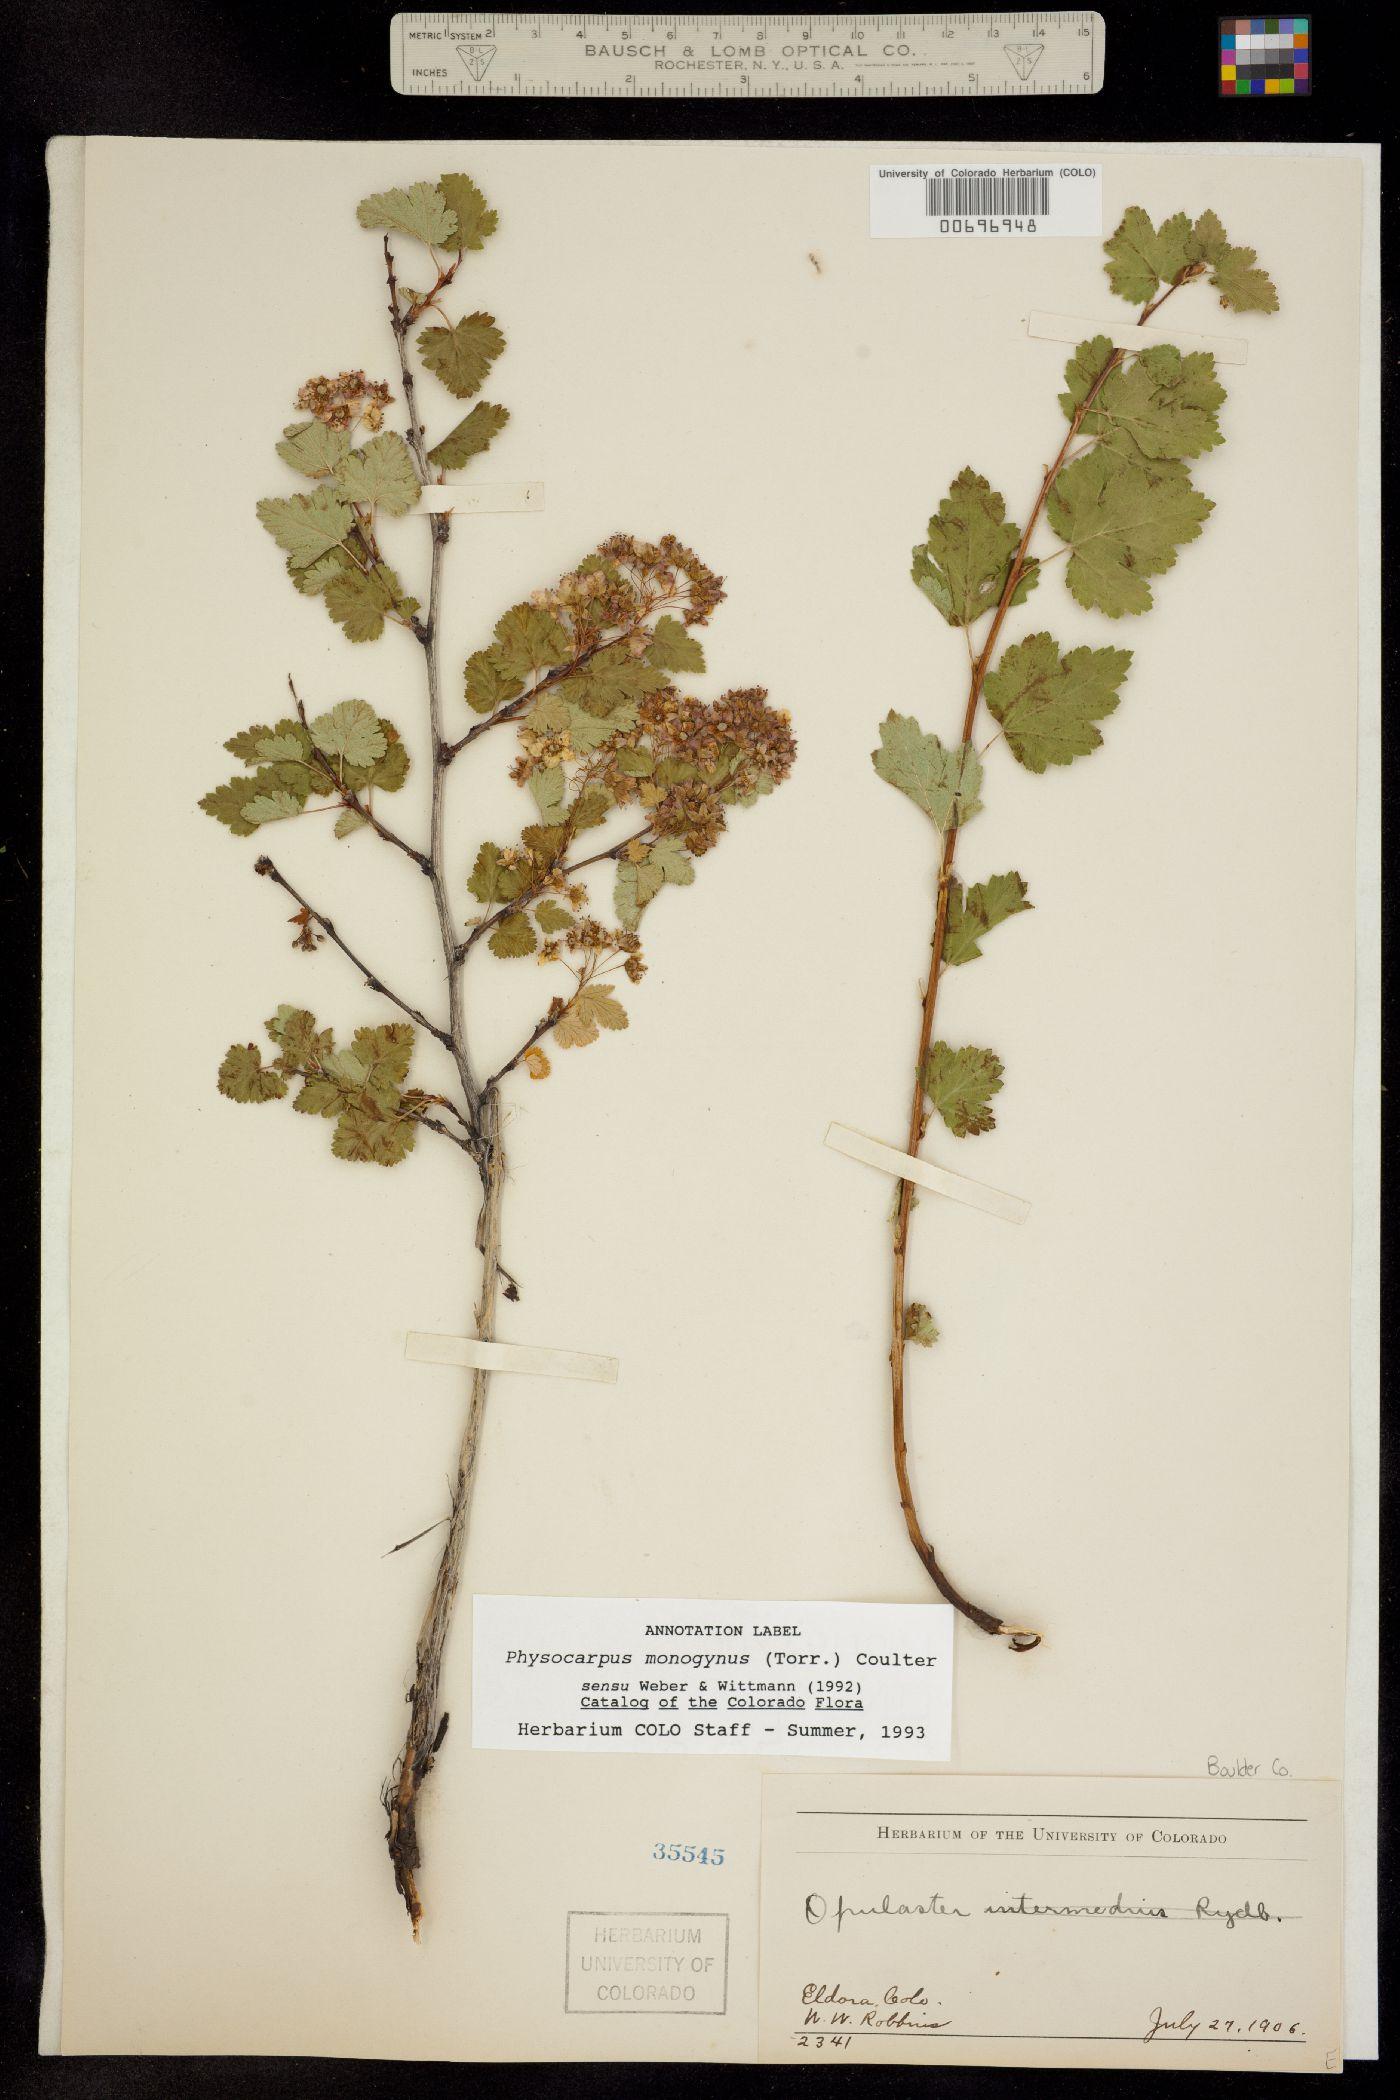 Physocarpus image